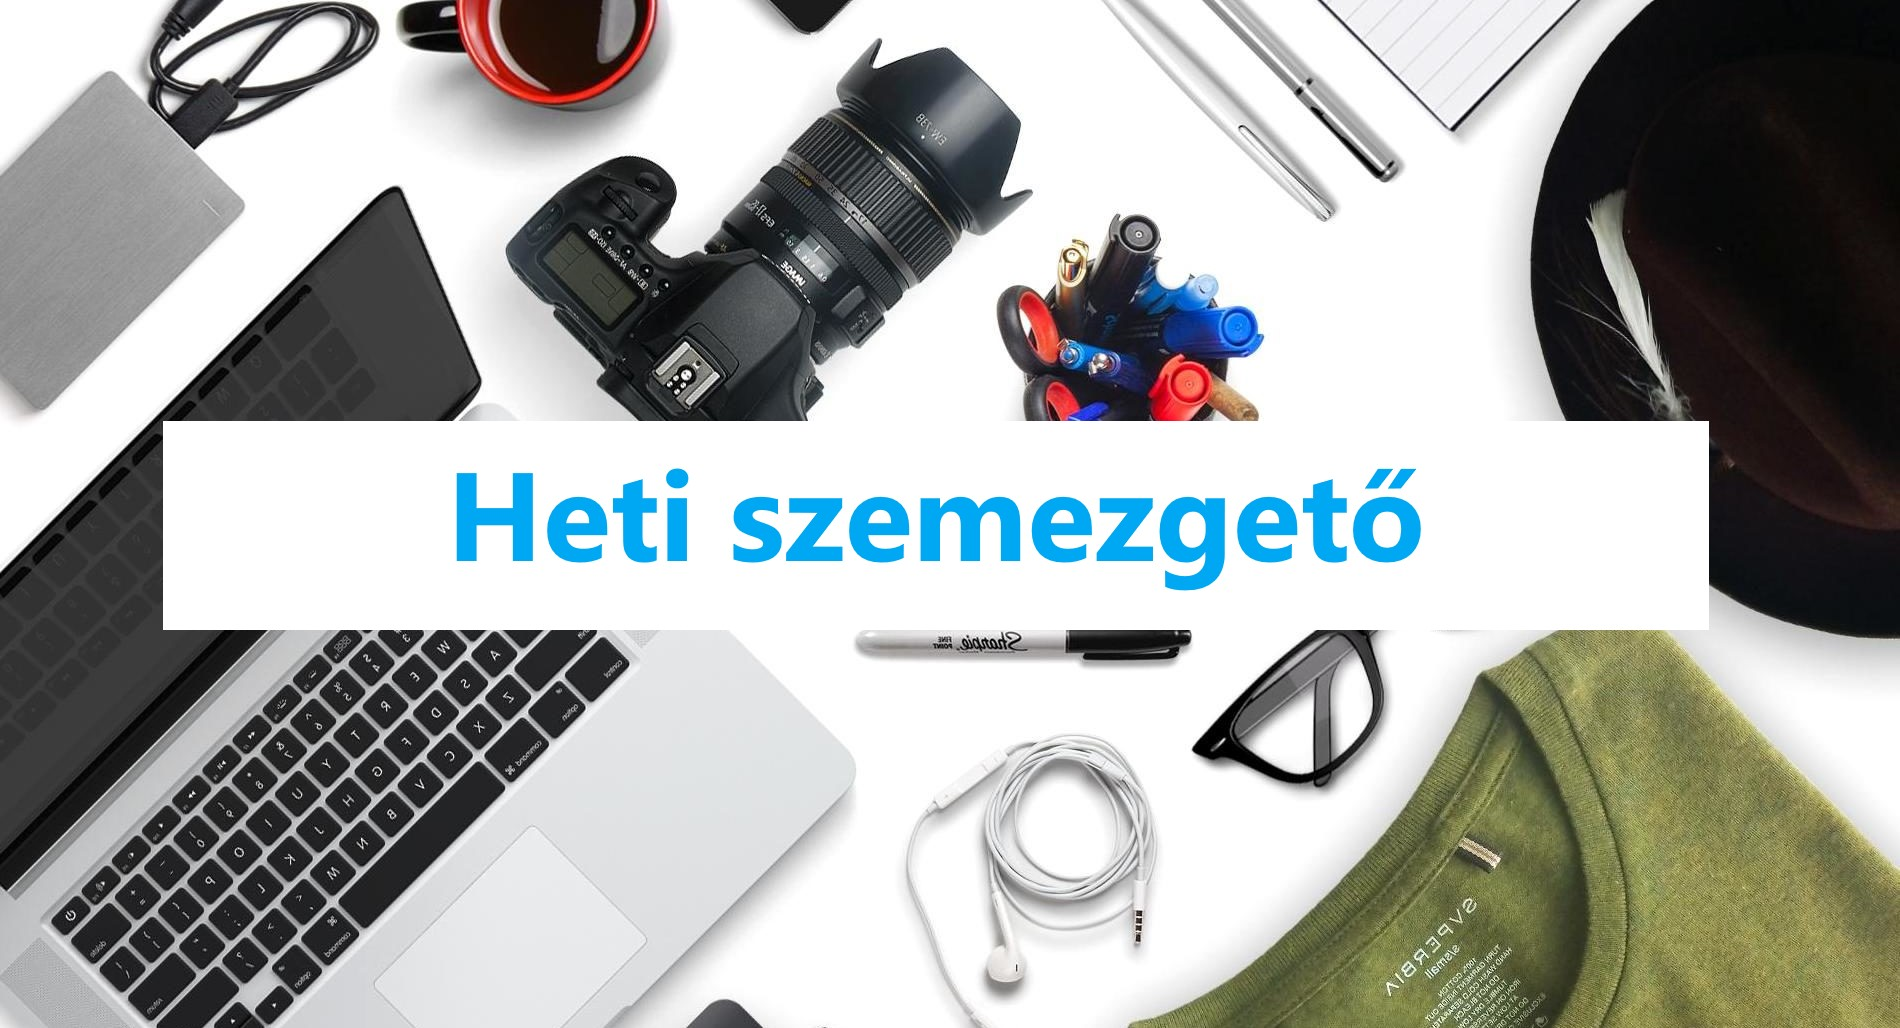 heti_szemezgeto_uj_39.jpg